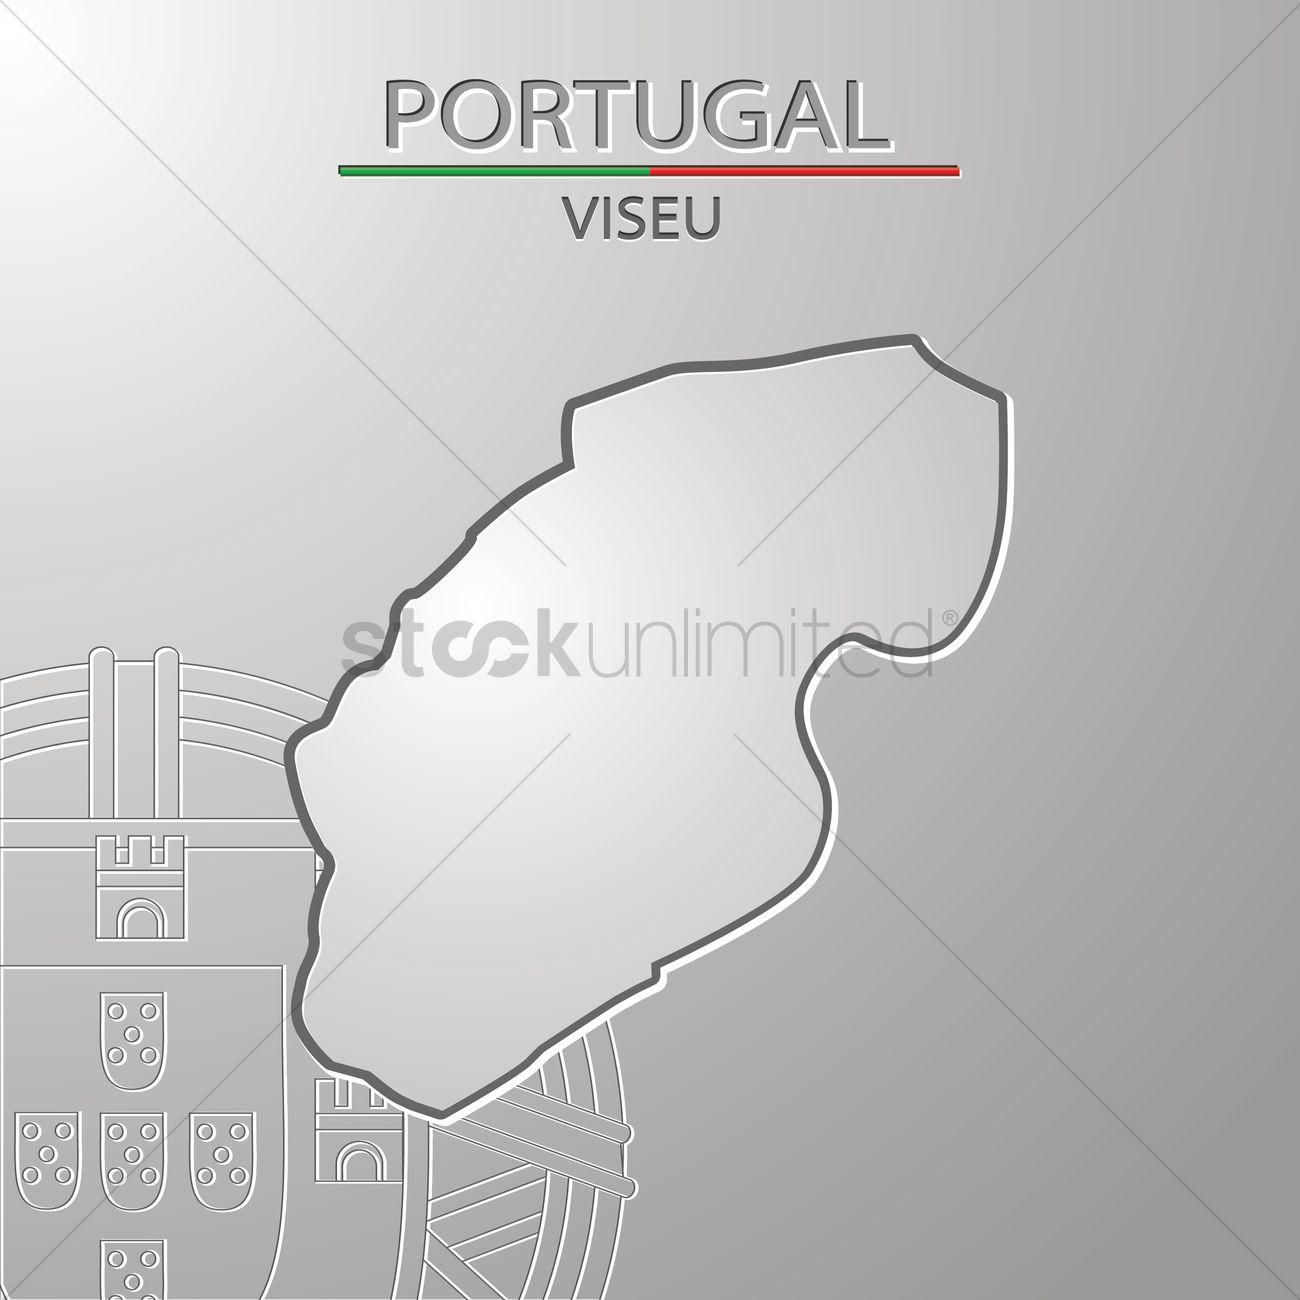 Viseu Map Vector Image StockUnlimited - Portugal map viseu